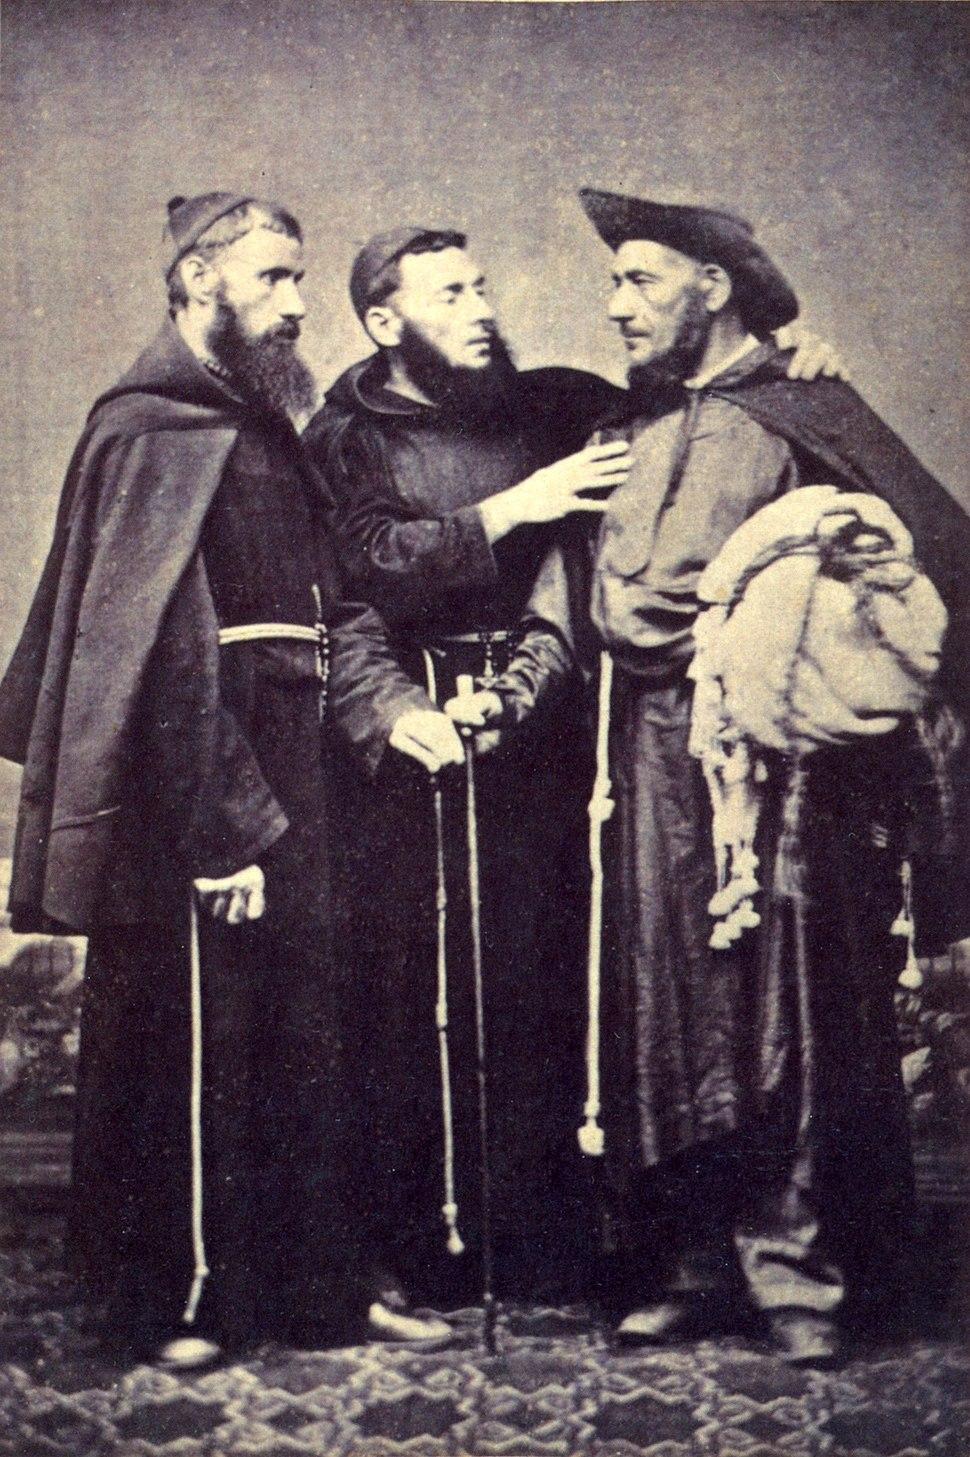 Brazilian friars 1875